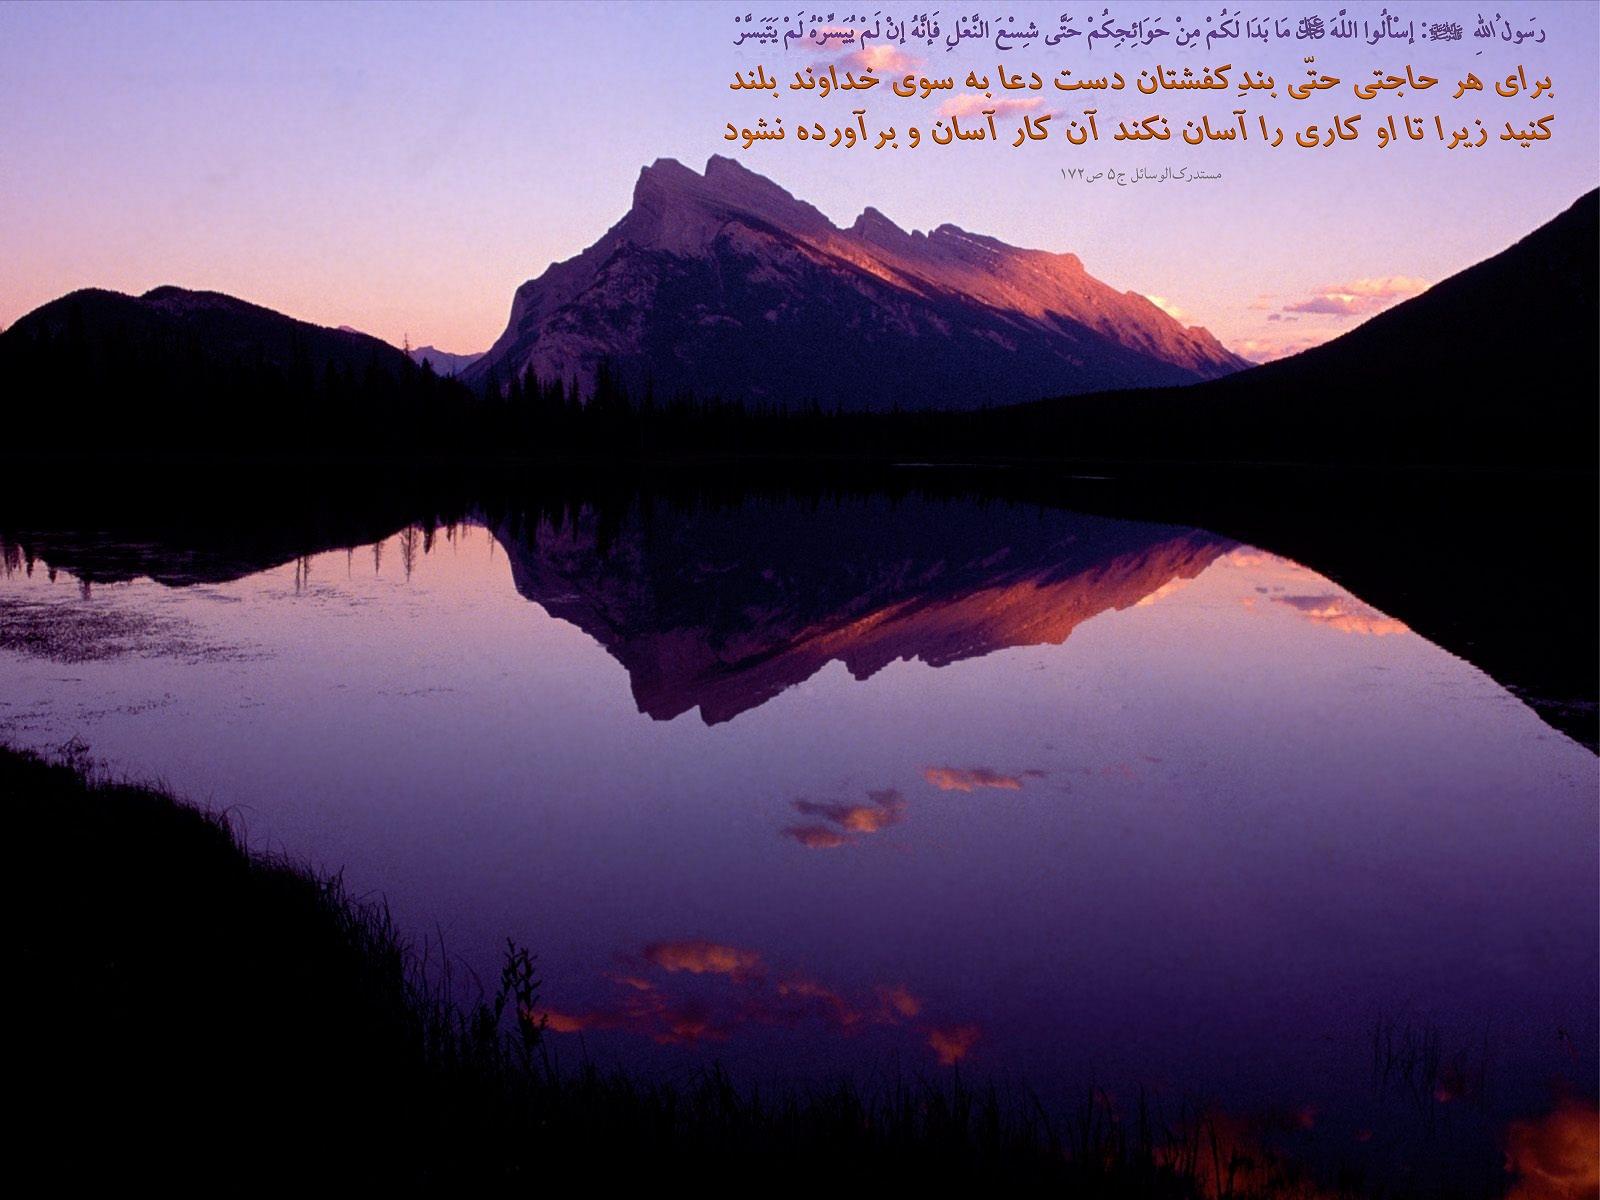 http://mhkh1972.gohardasht.com/uploaded/_7E3E050B-F85A-4850-8D1A-7C4CC975B723_.jpg